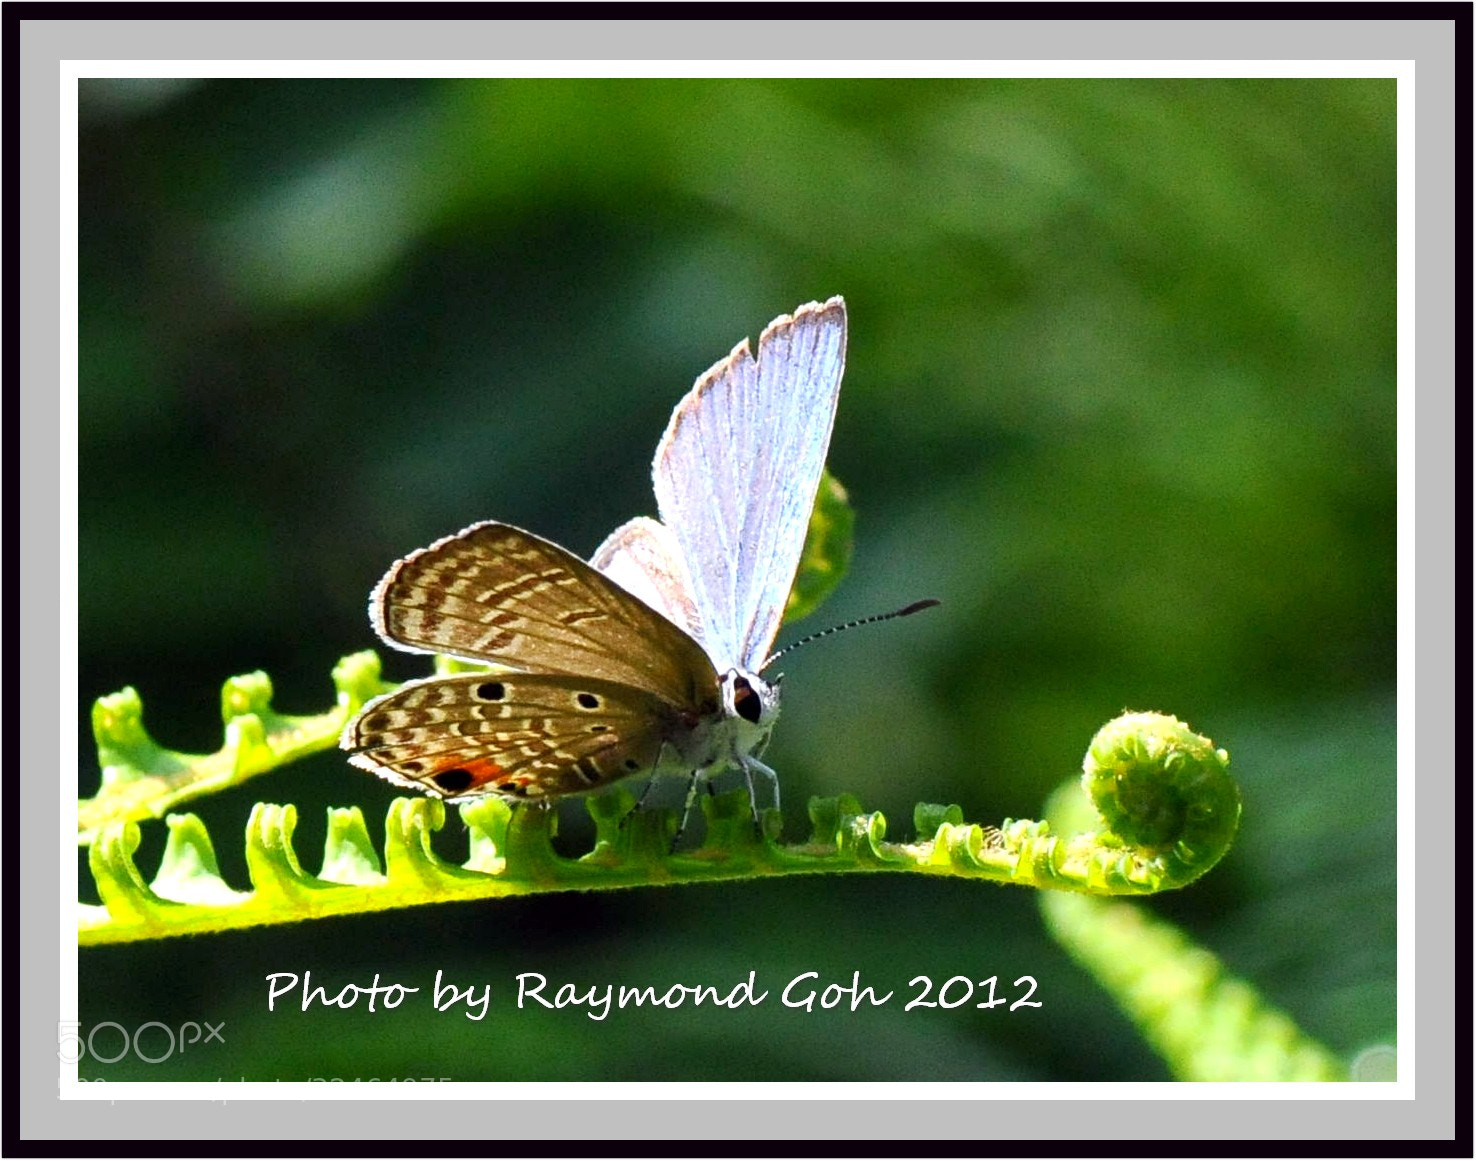 Photograph Butterfly @ Botanic Gardens #3 by GohRaymond Photography on 500px